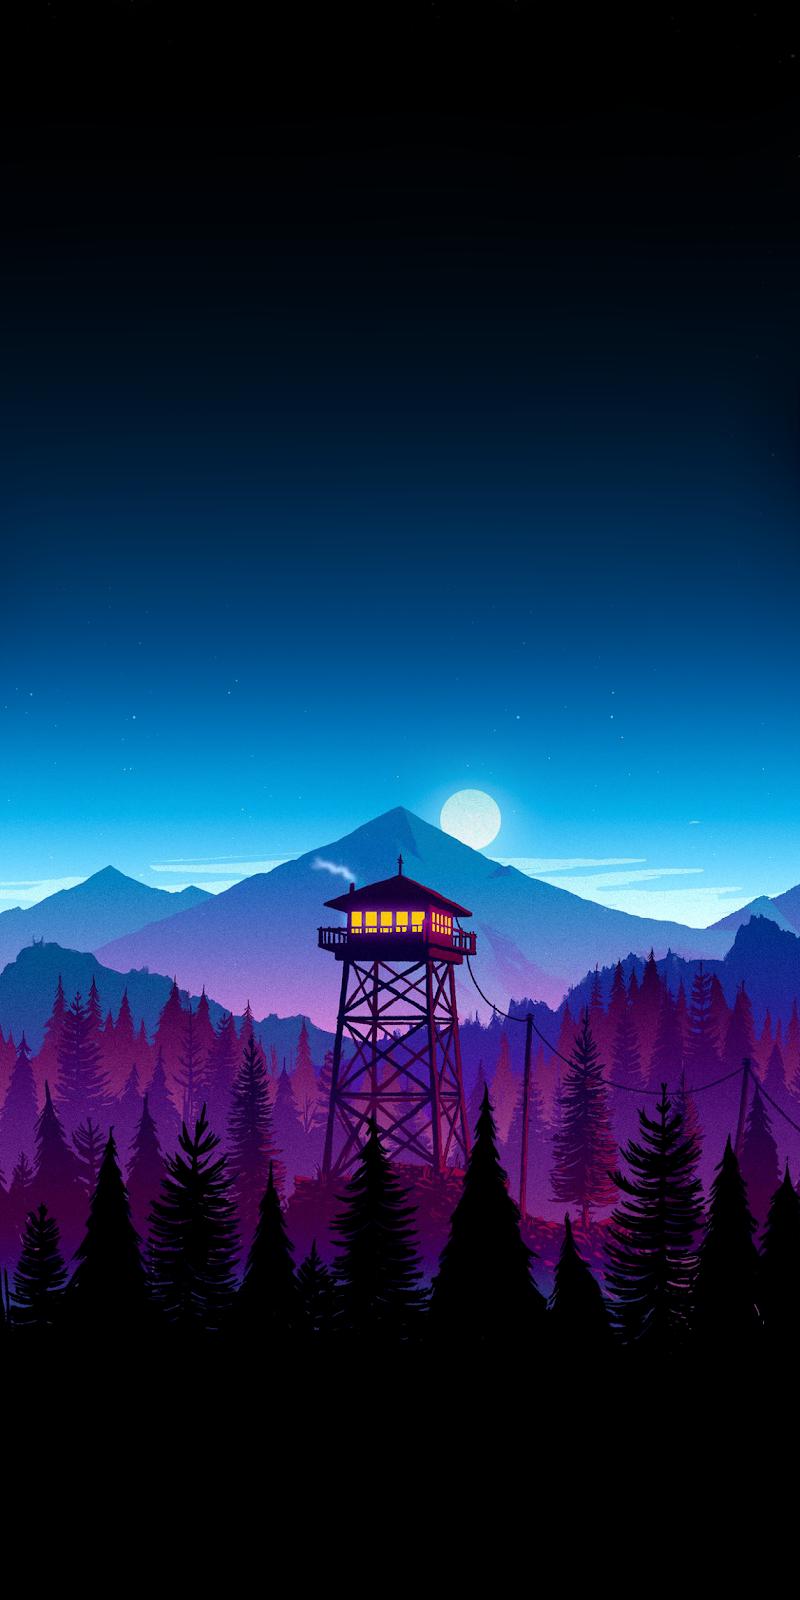 Get Top iOS Phone Wallpaper HD 2020 by bluewallpaperaesthetic.blogspot.se